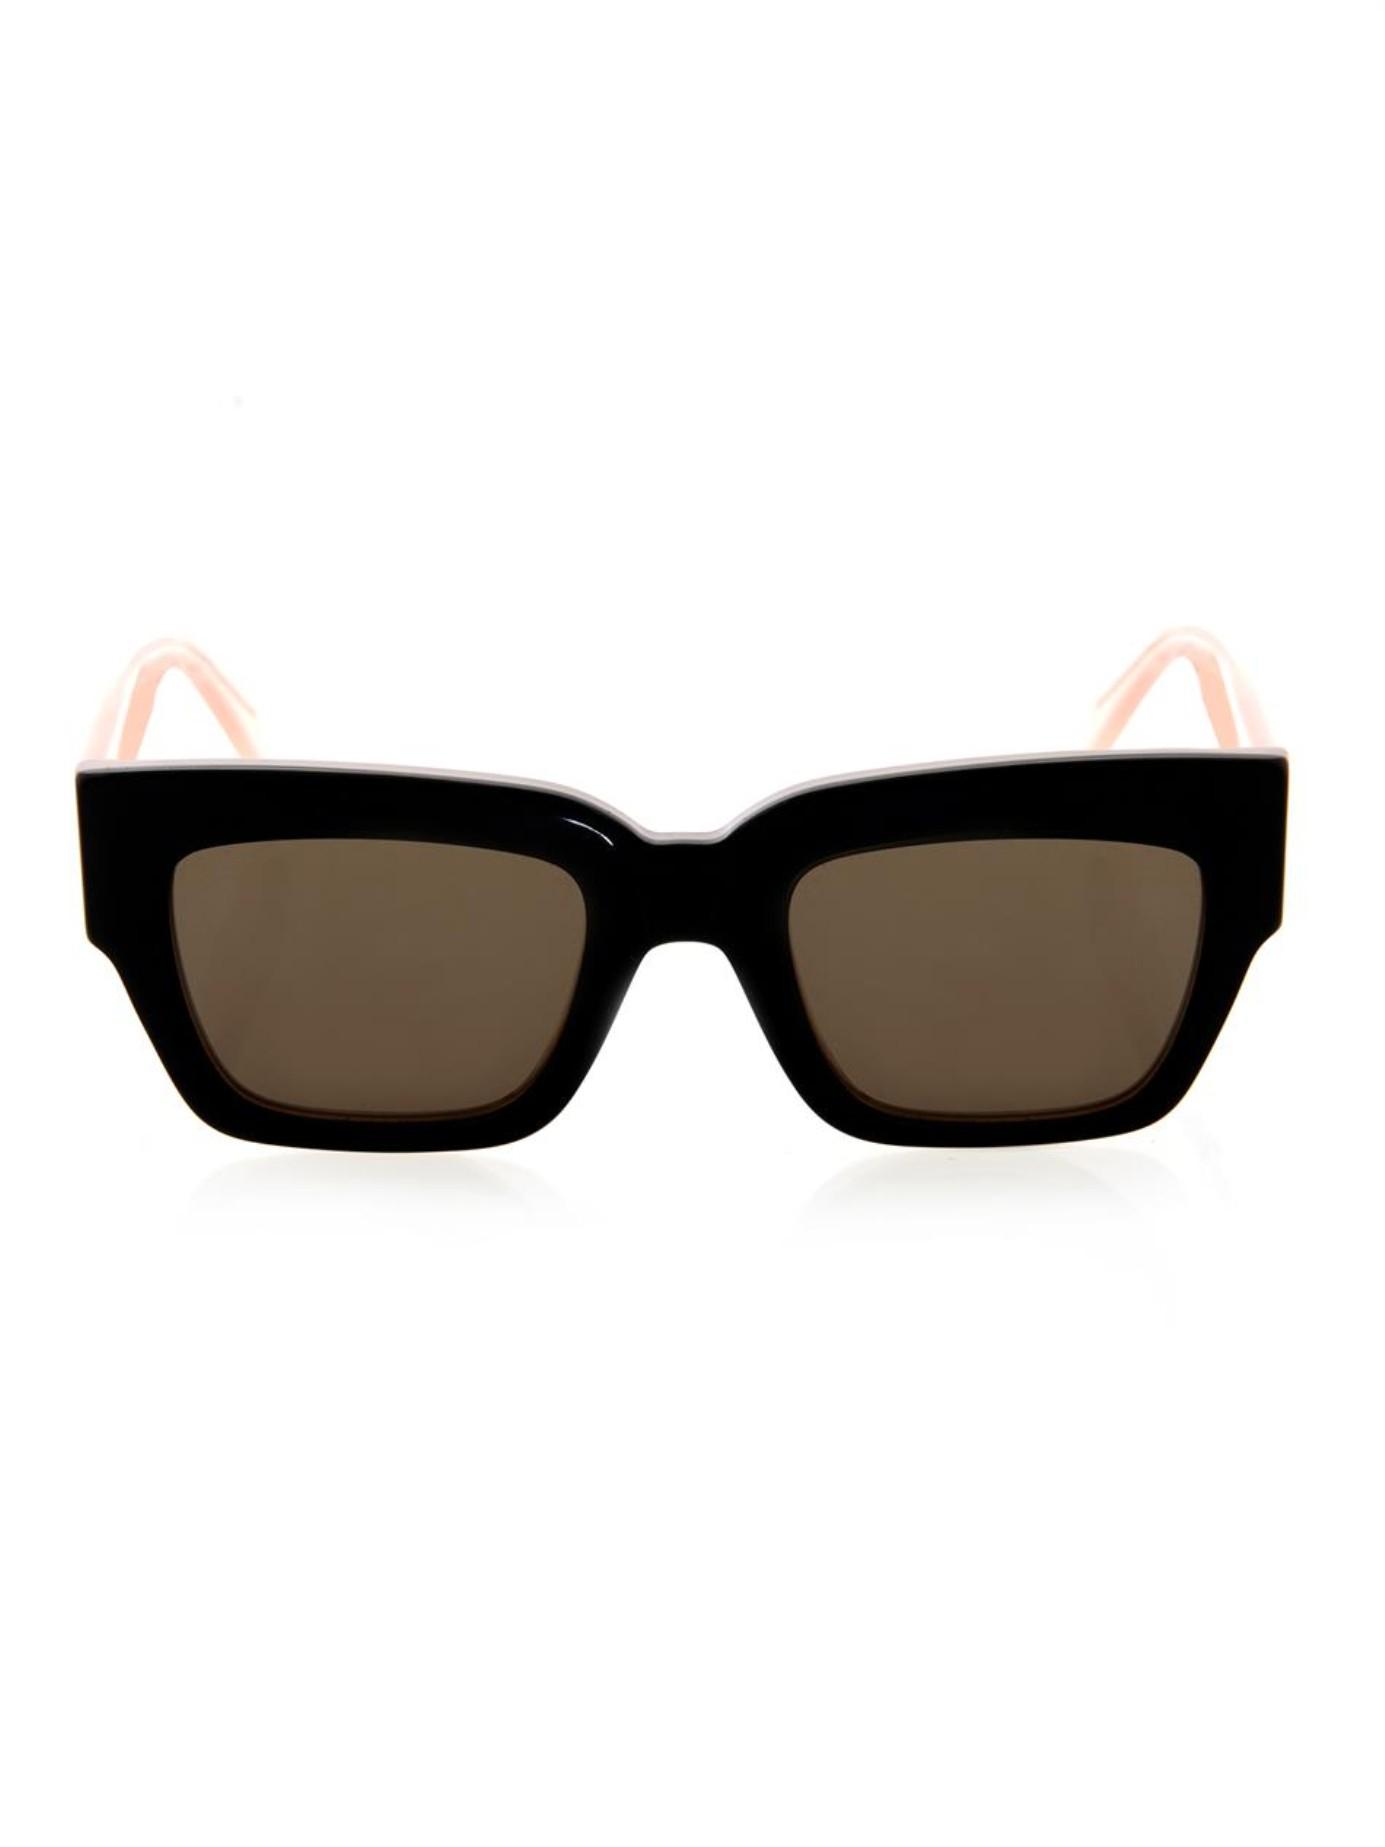 e99237a2c71 Black Celine Square Frame Eyeglasses